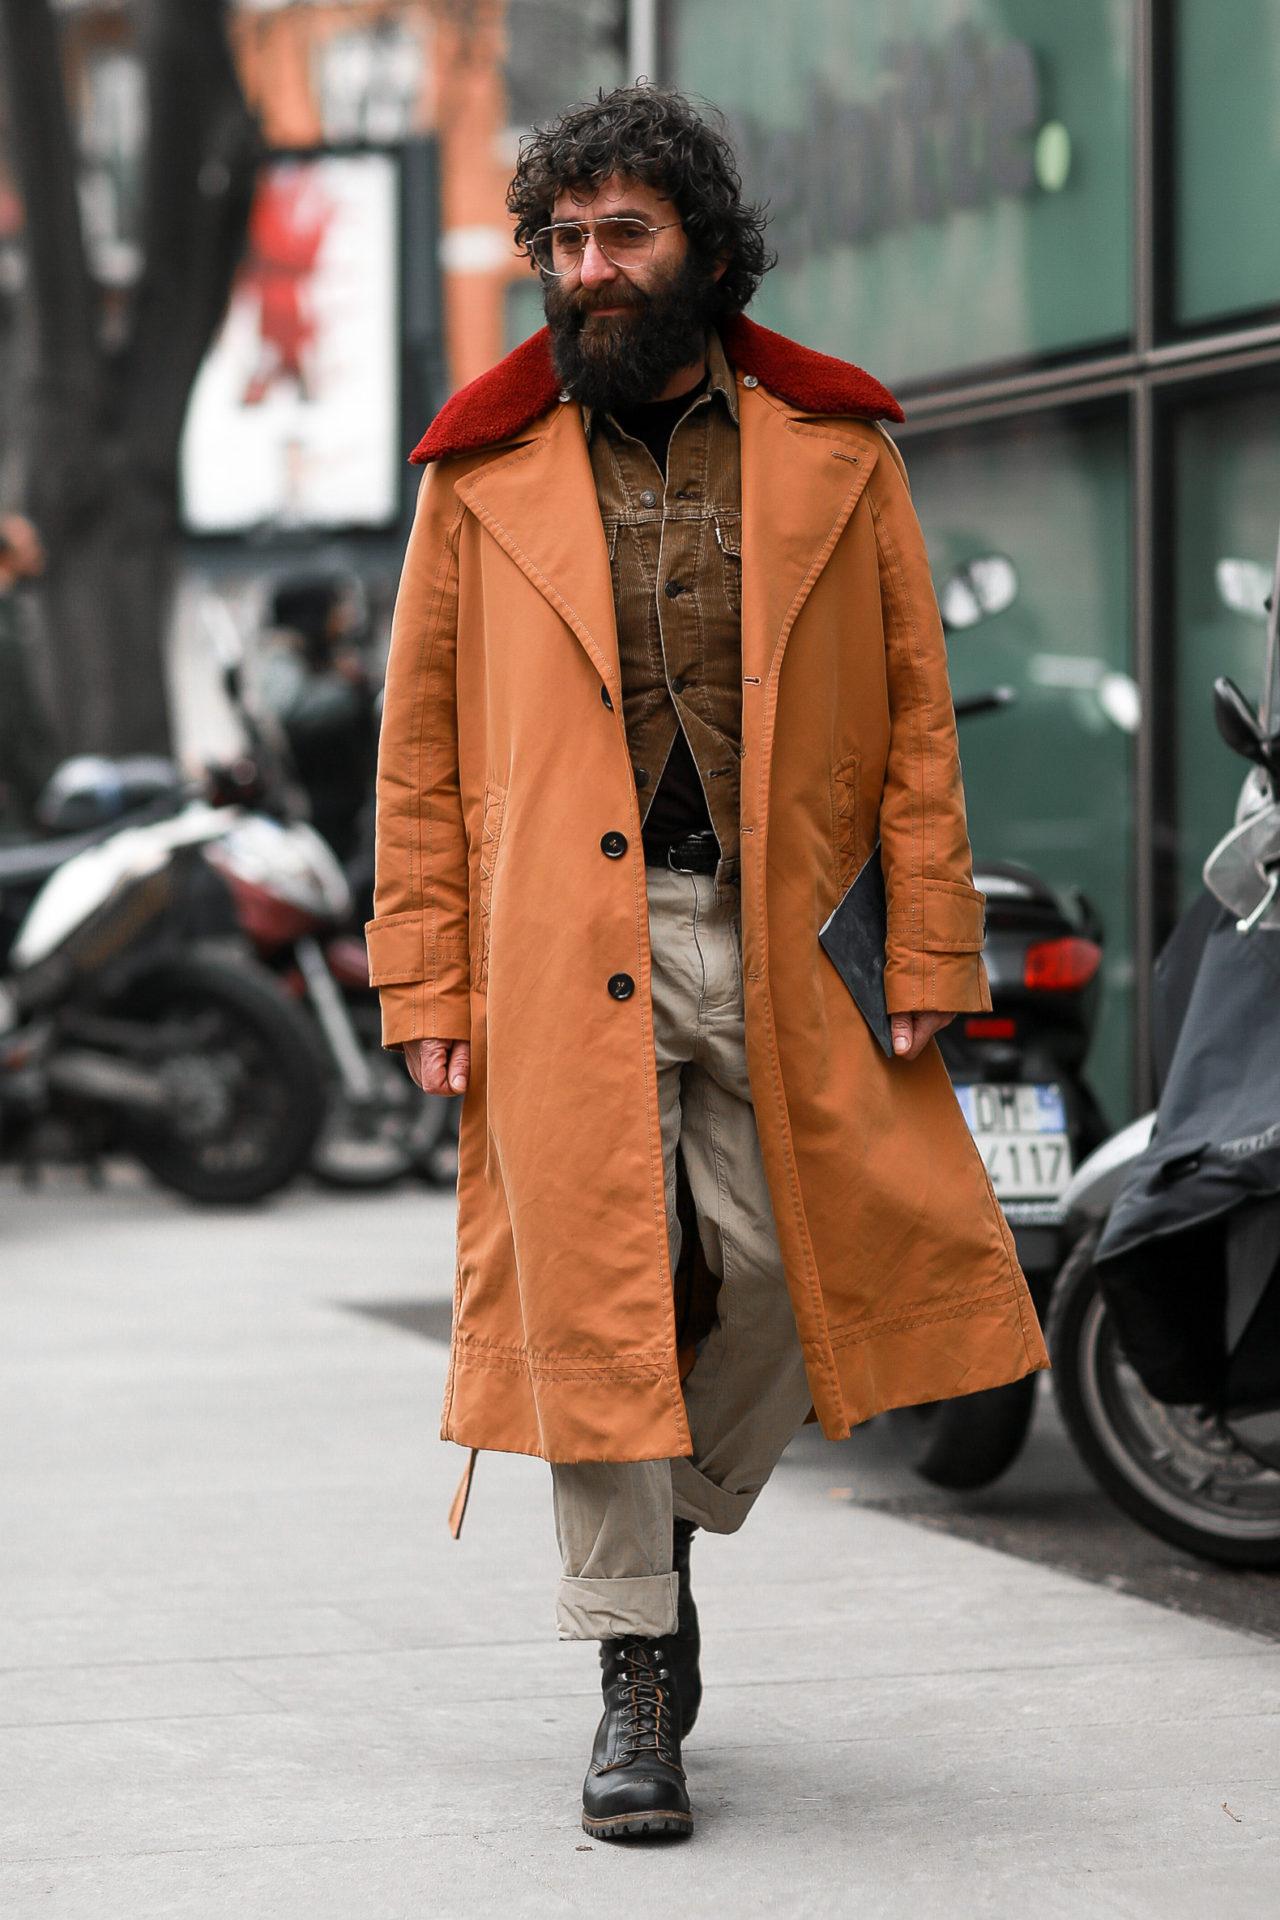 Street Style from Milan Fashion Week AW18: Yilmaz Aktepe